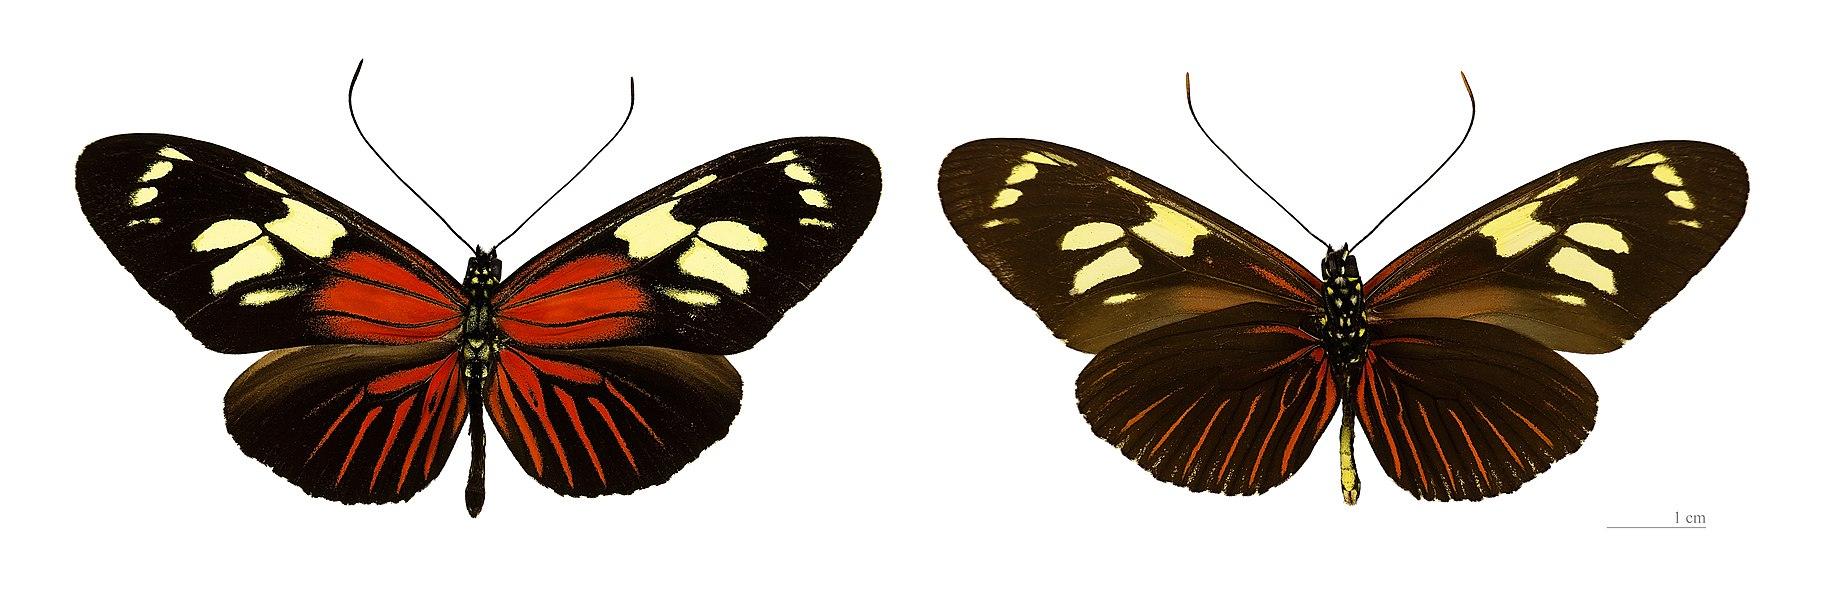 English:  Heliconius burneyi catharinae - Two views of same specimen